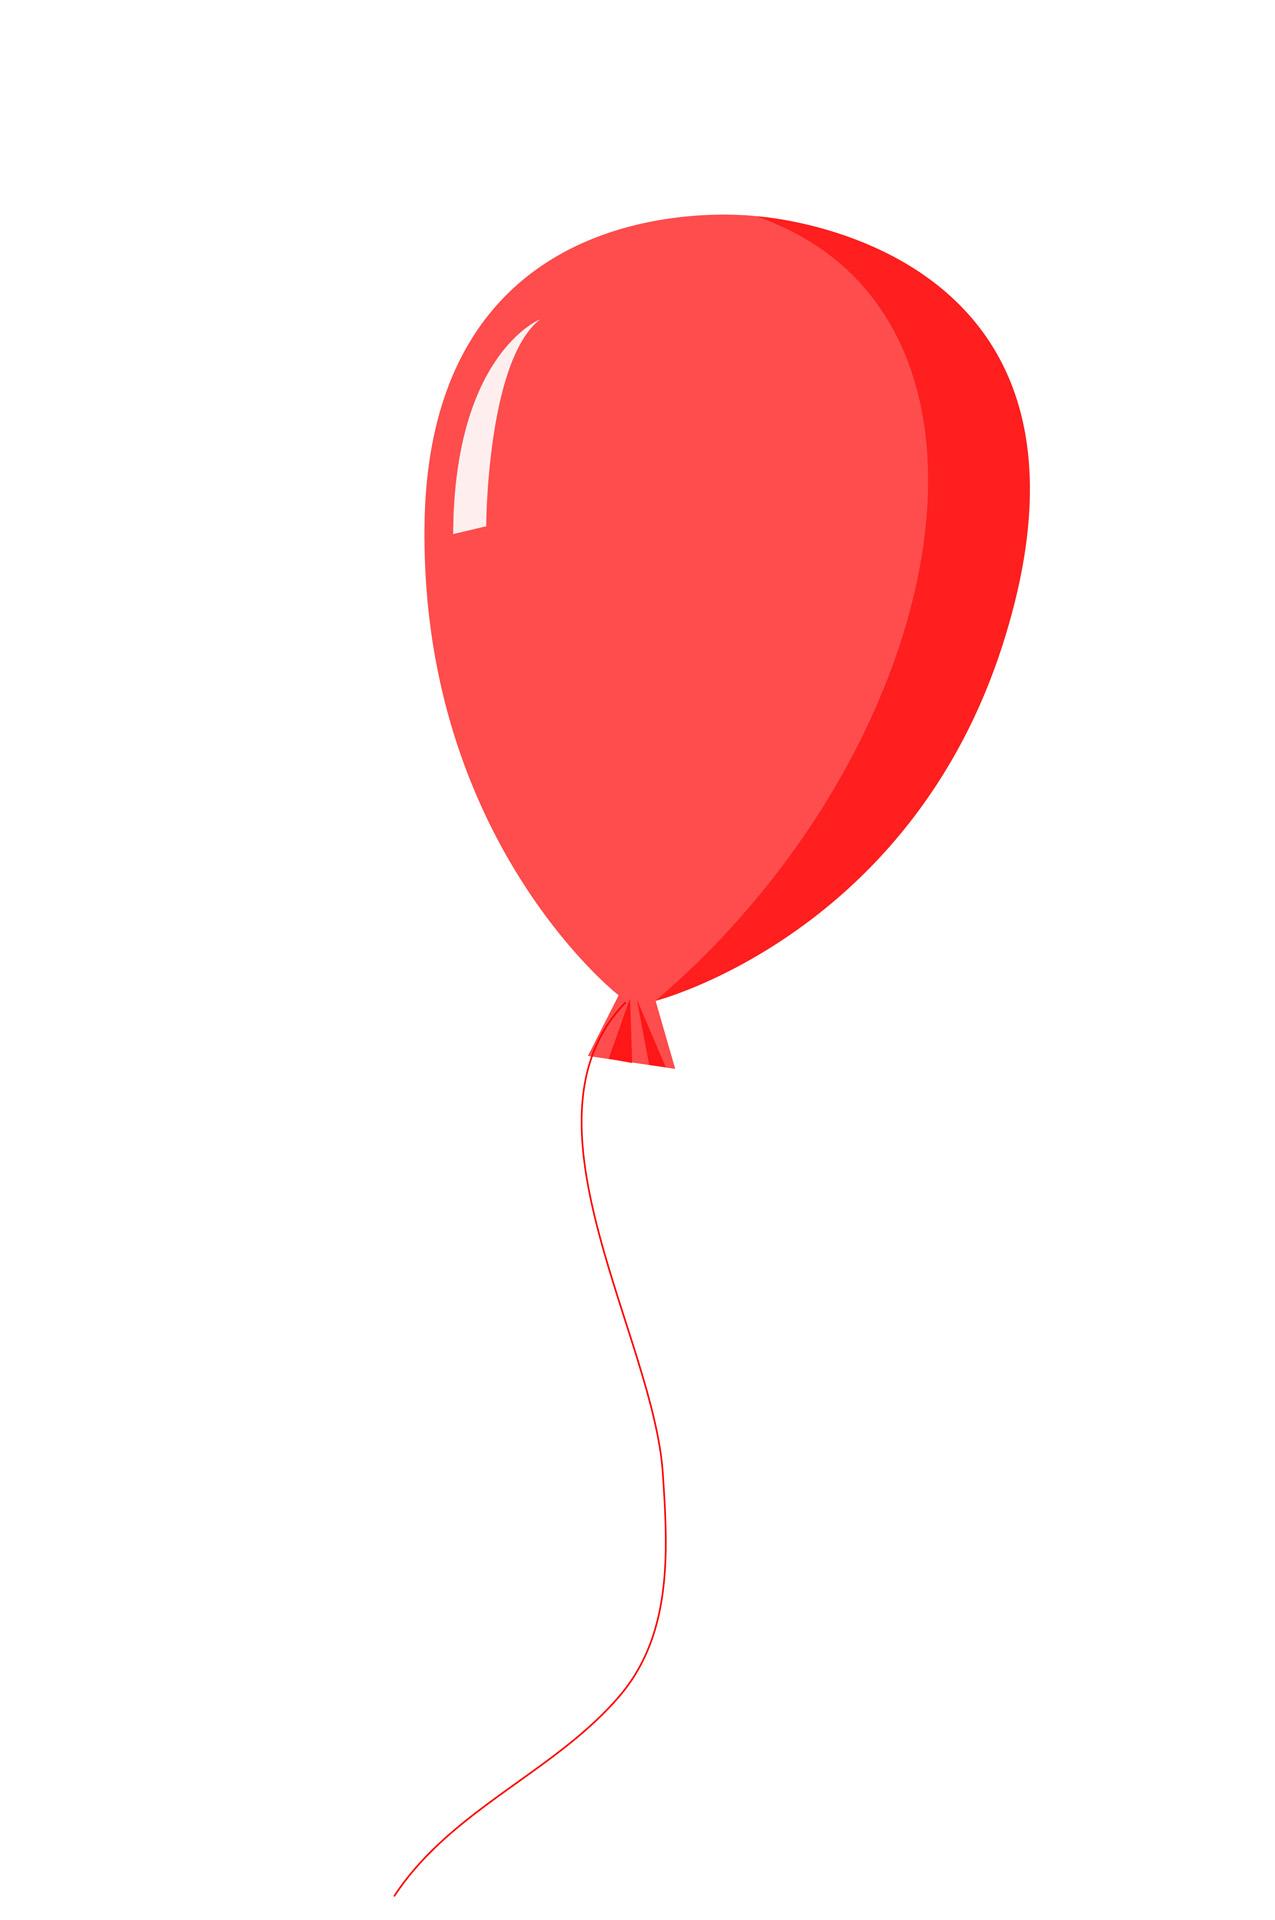 Clip art balloons clipart on .-Clip art balloons clipart on .-12